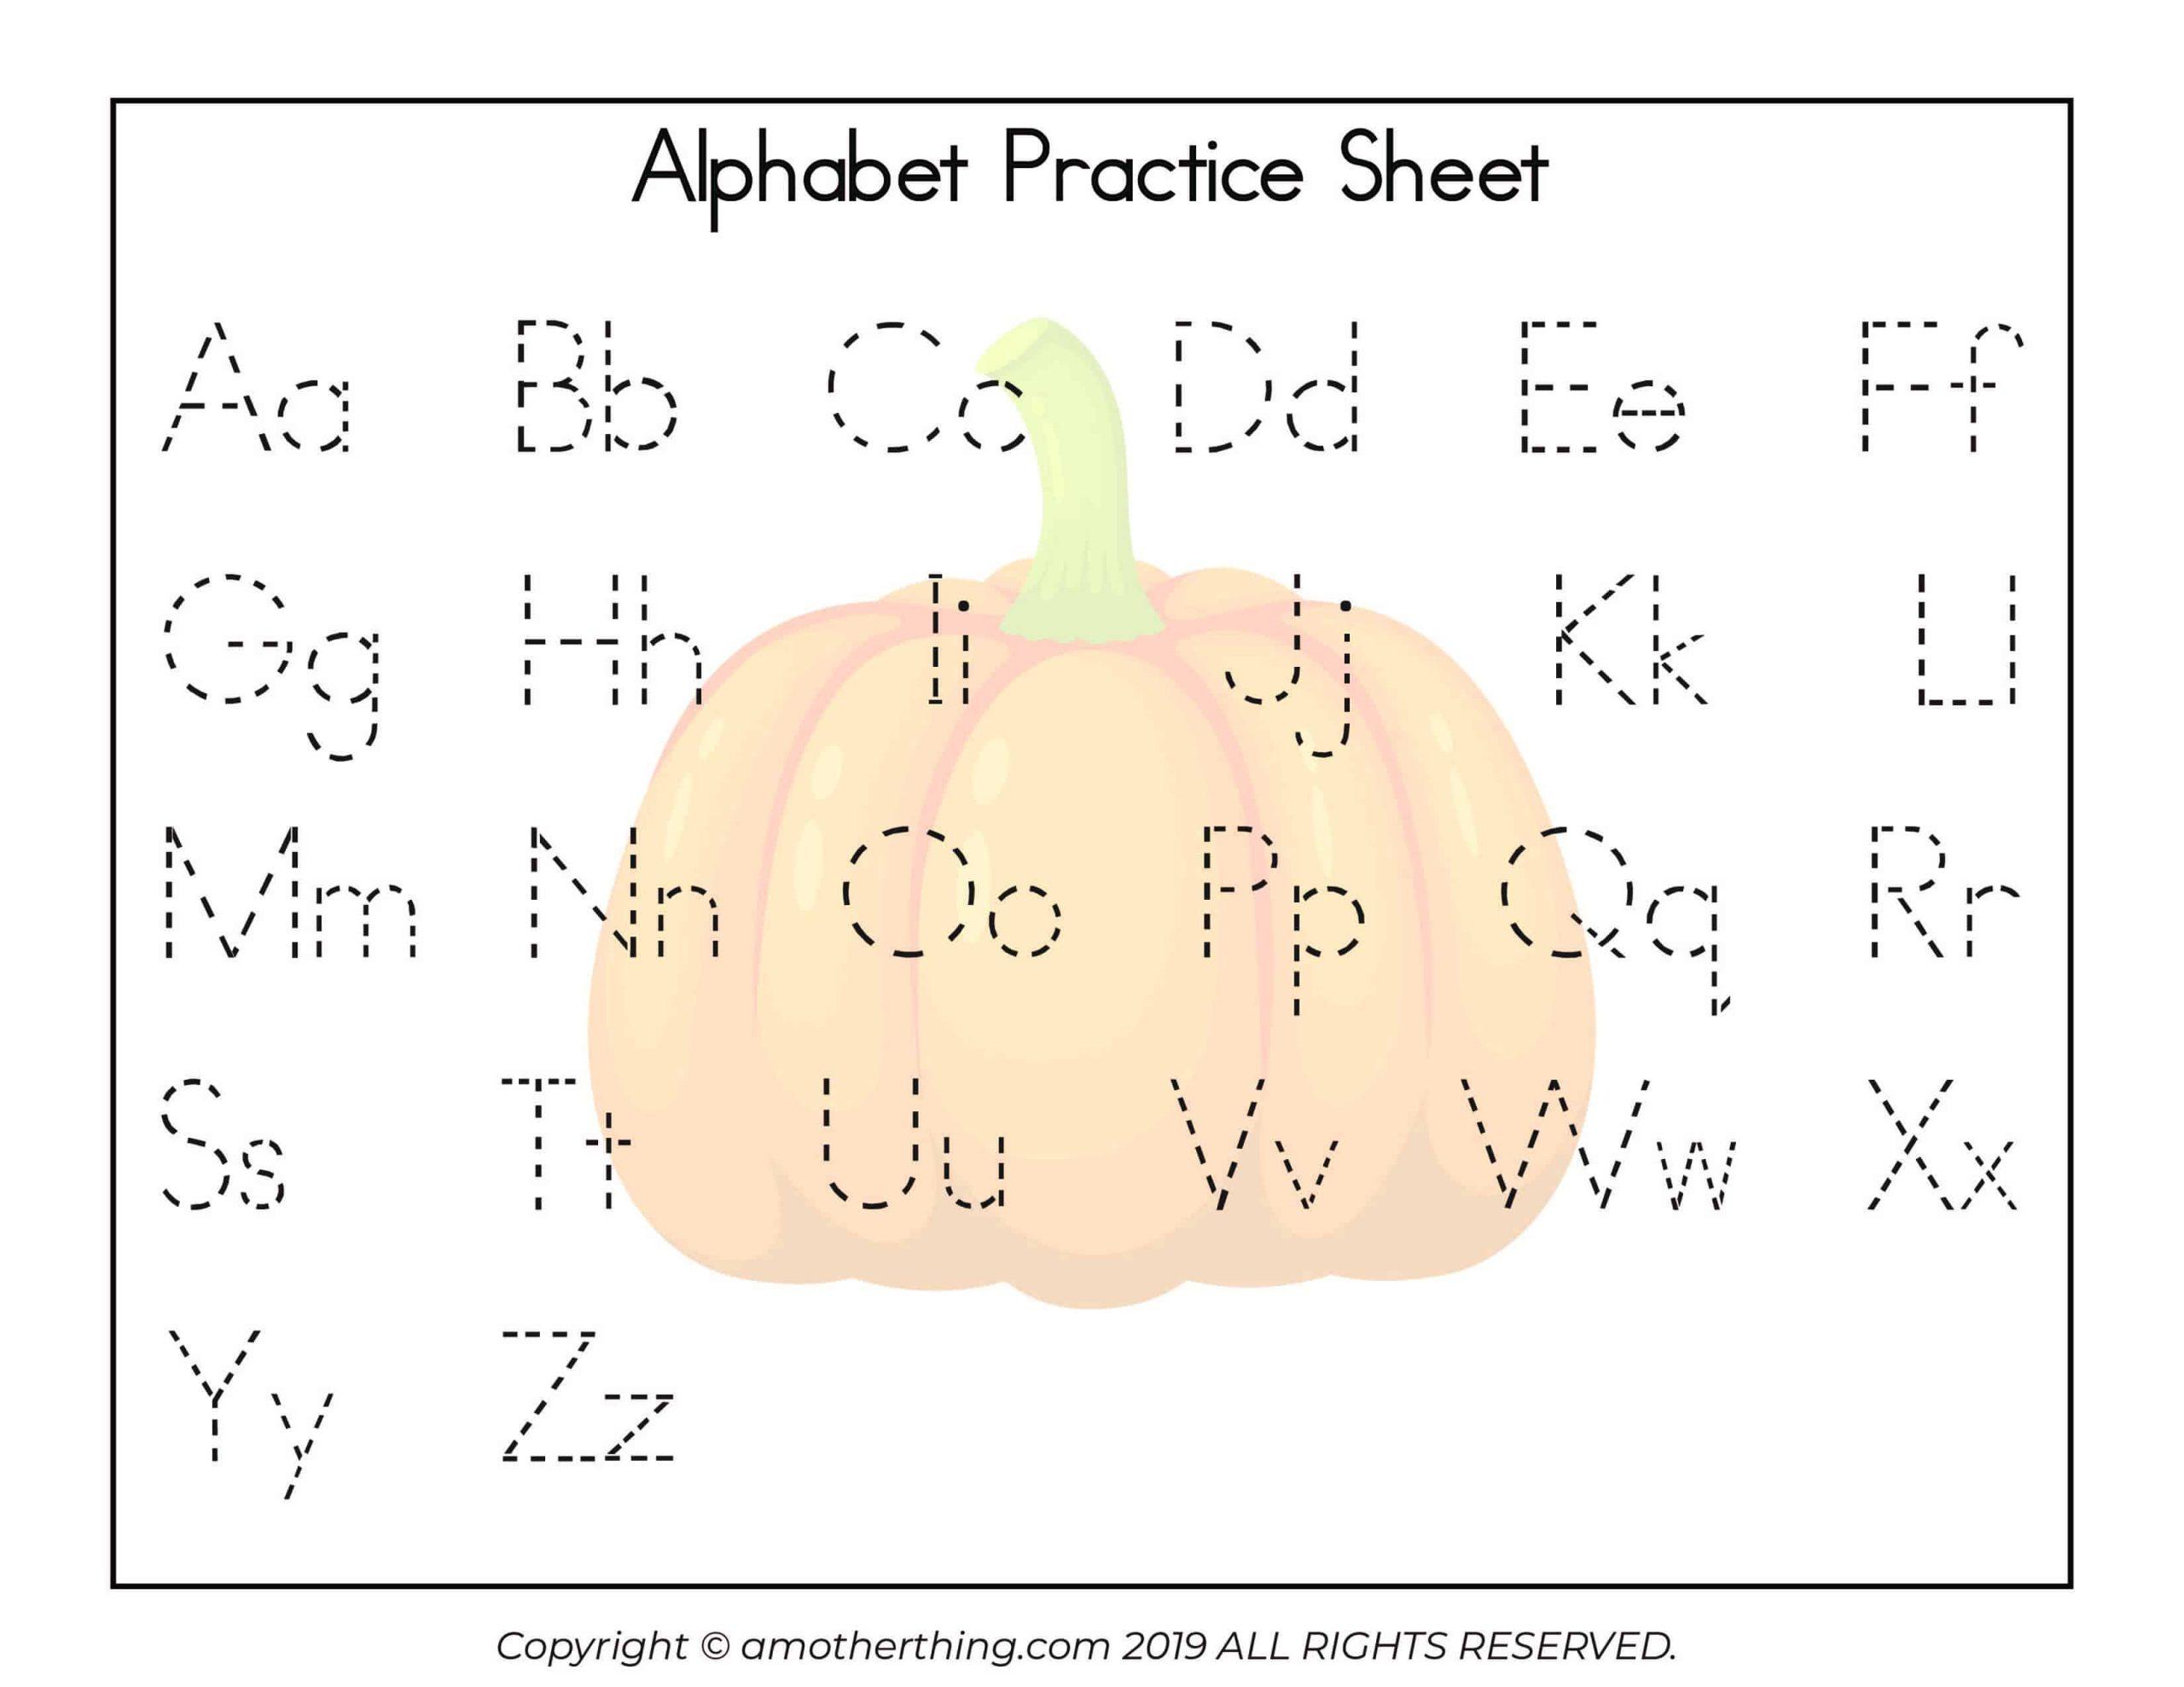 Free Printable Autumn Abc Writing Practice Worksheets